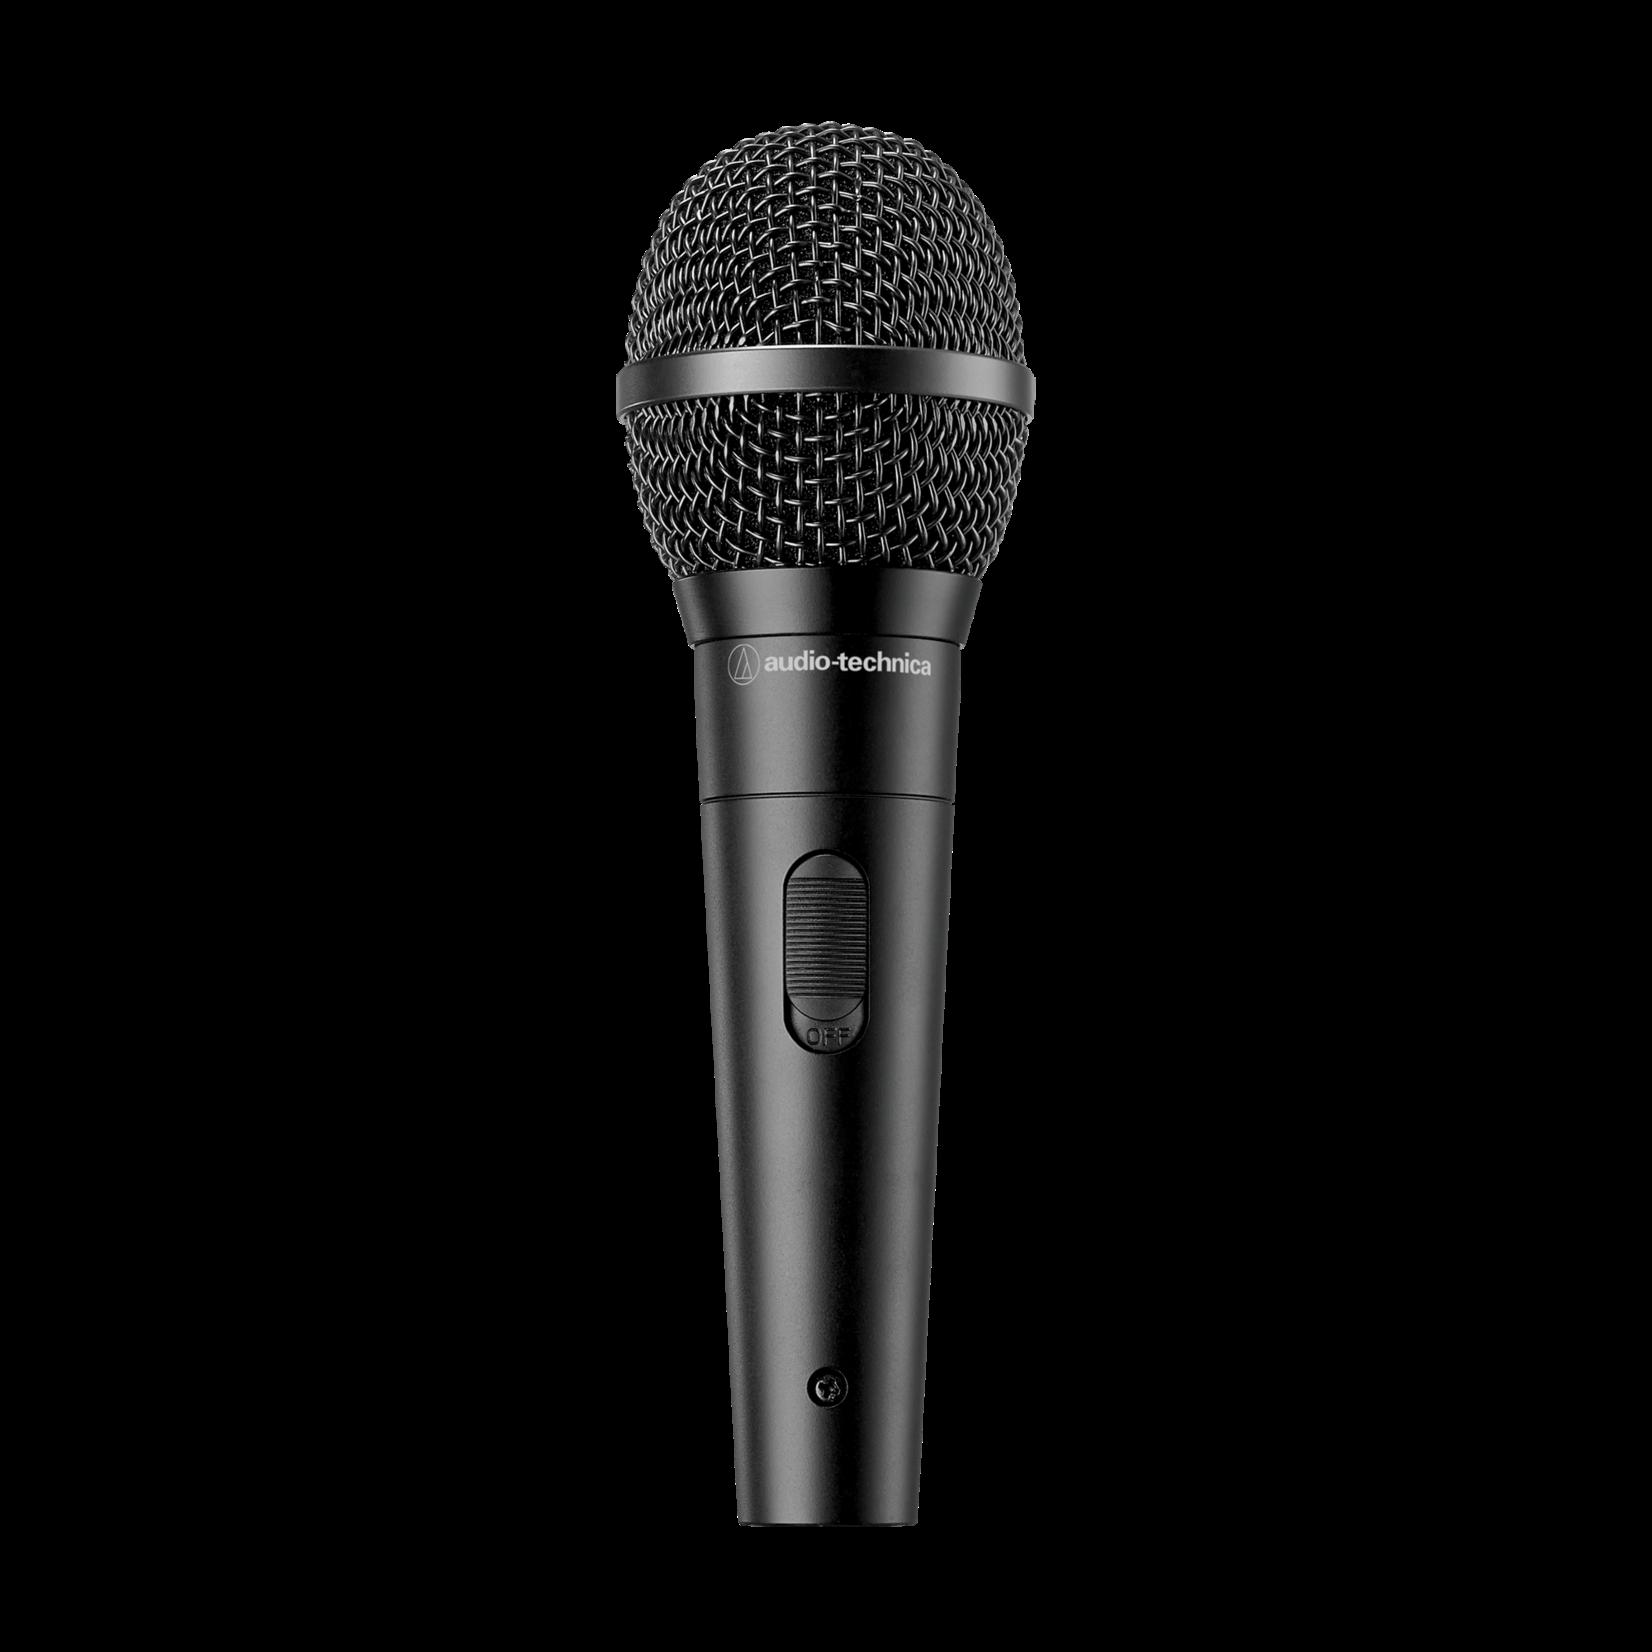 AUDIO-TECHNICA ATR1300X DYNAMIC VOCAL / INTSTRUMENT MICROPHONE